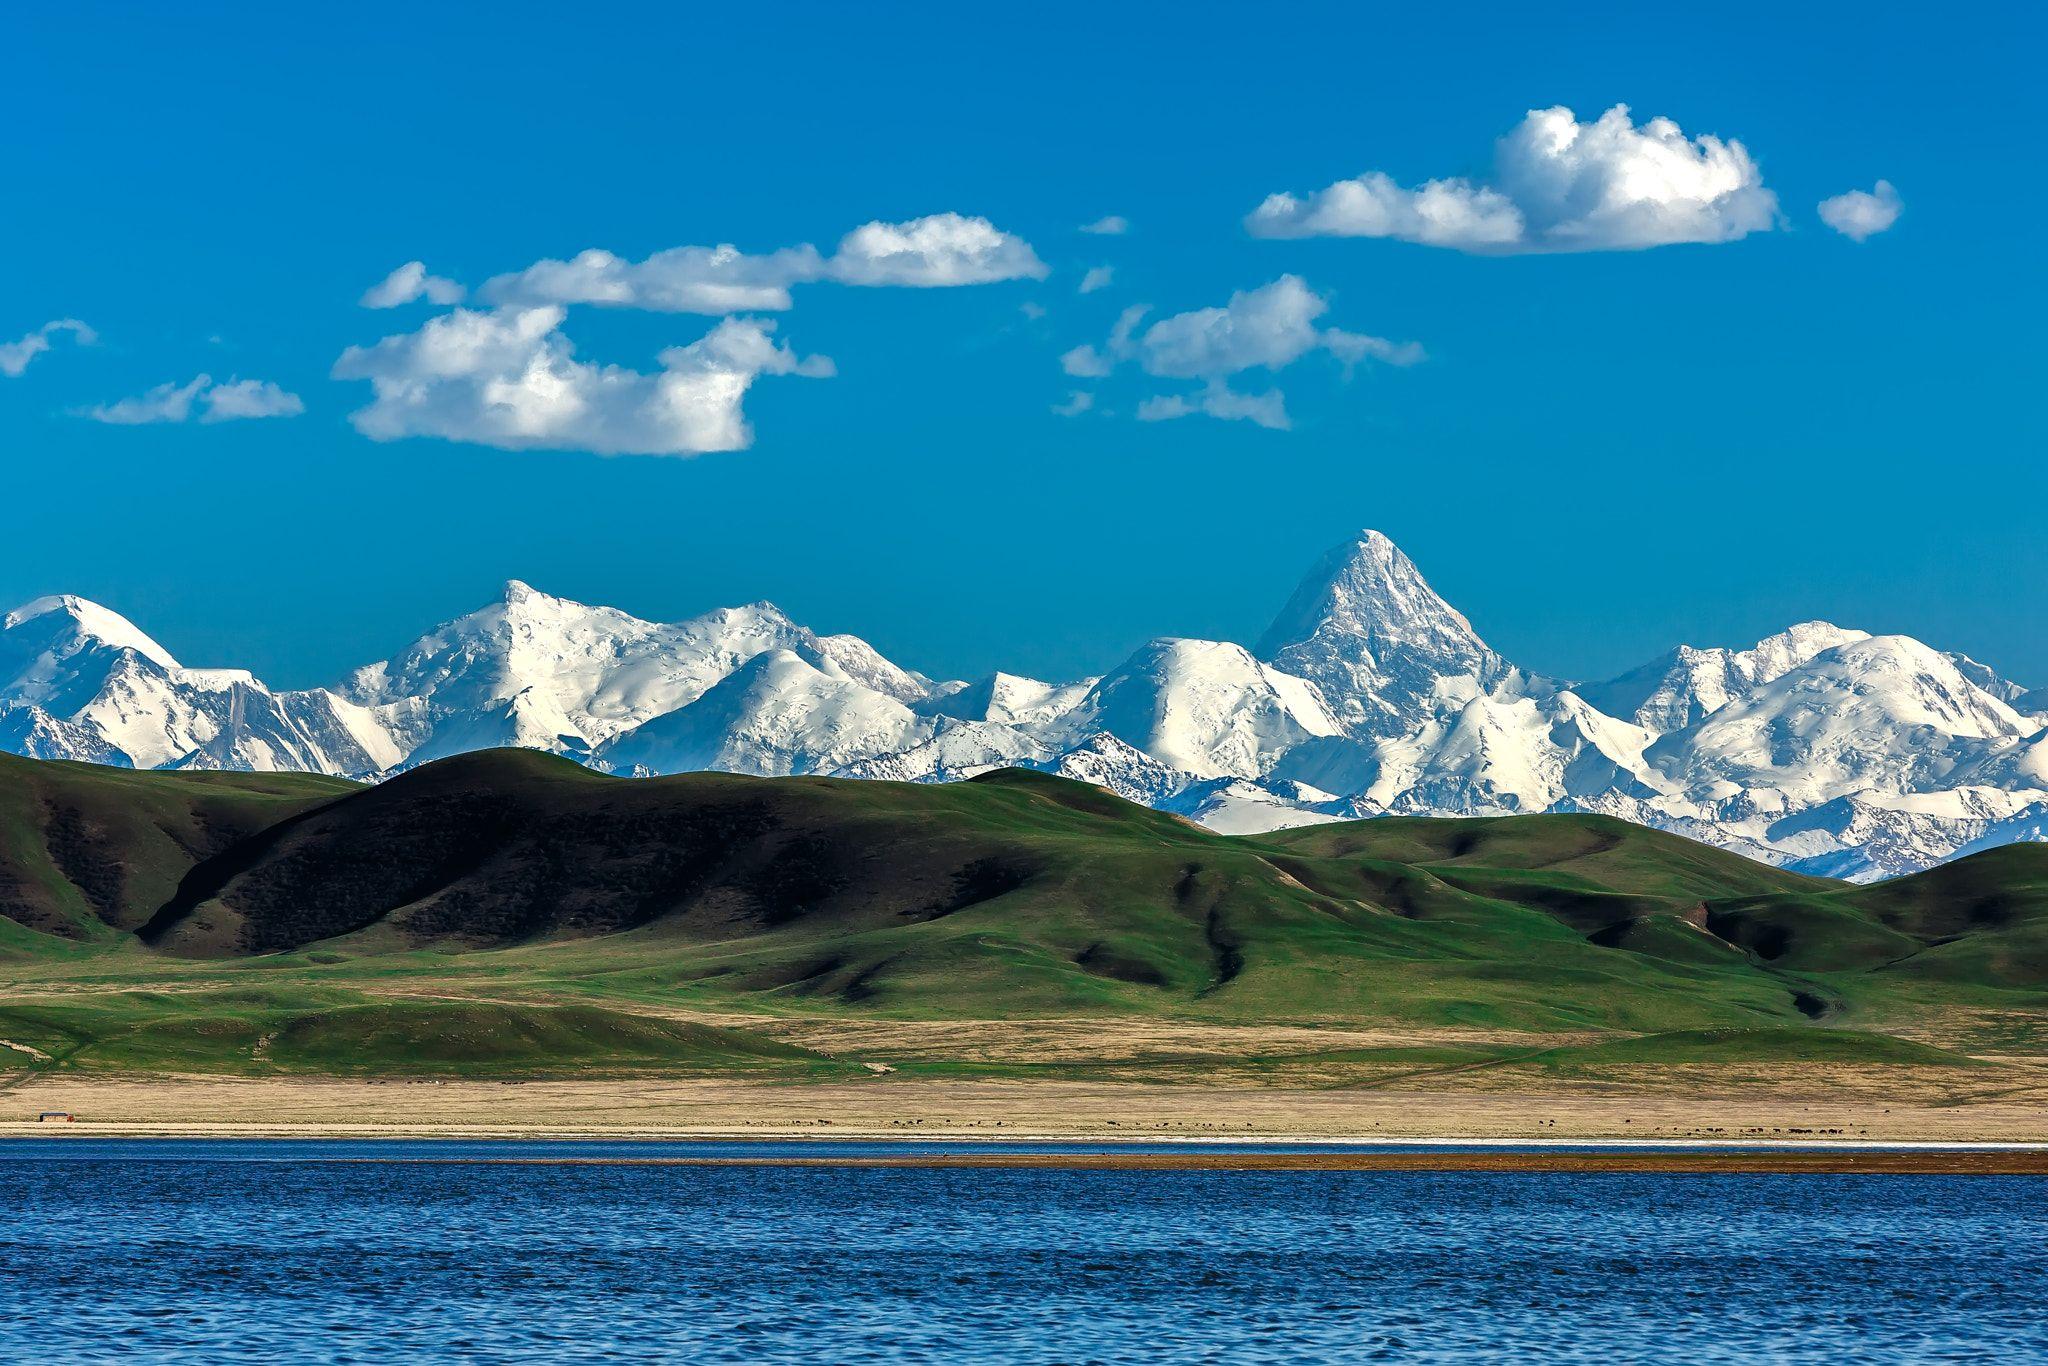 Dead Lake of Kyrgyzstan